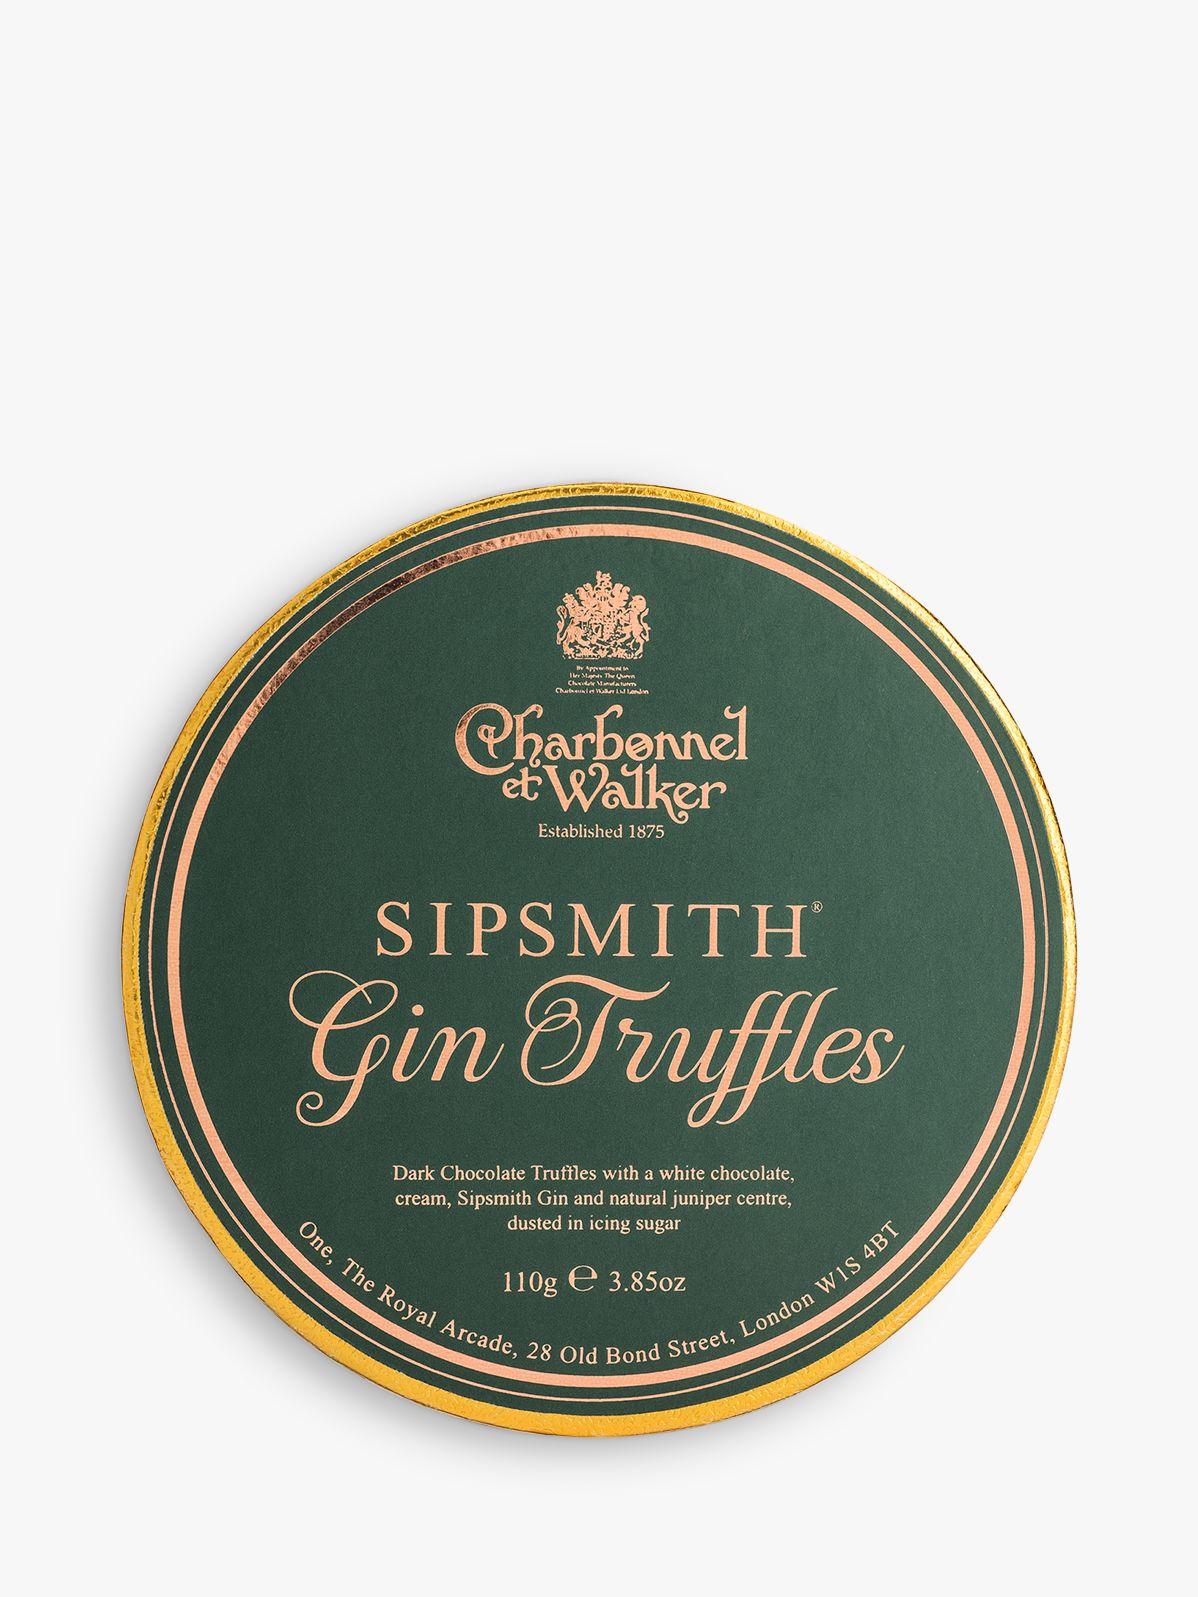 Charbonnel et Walker Charbonnel et Walker Sipsmith Gin Truffles, 110g